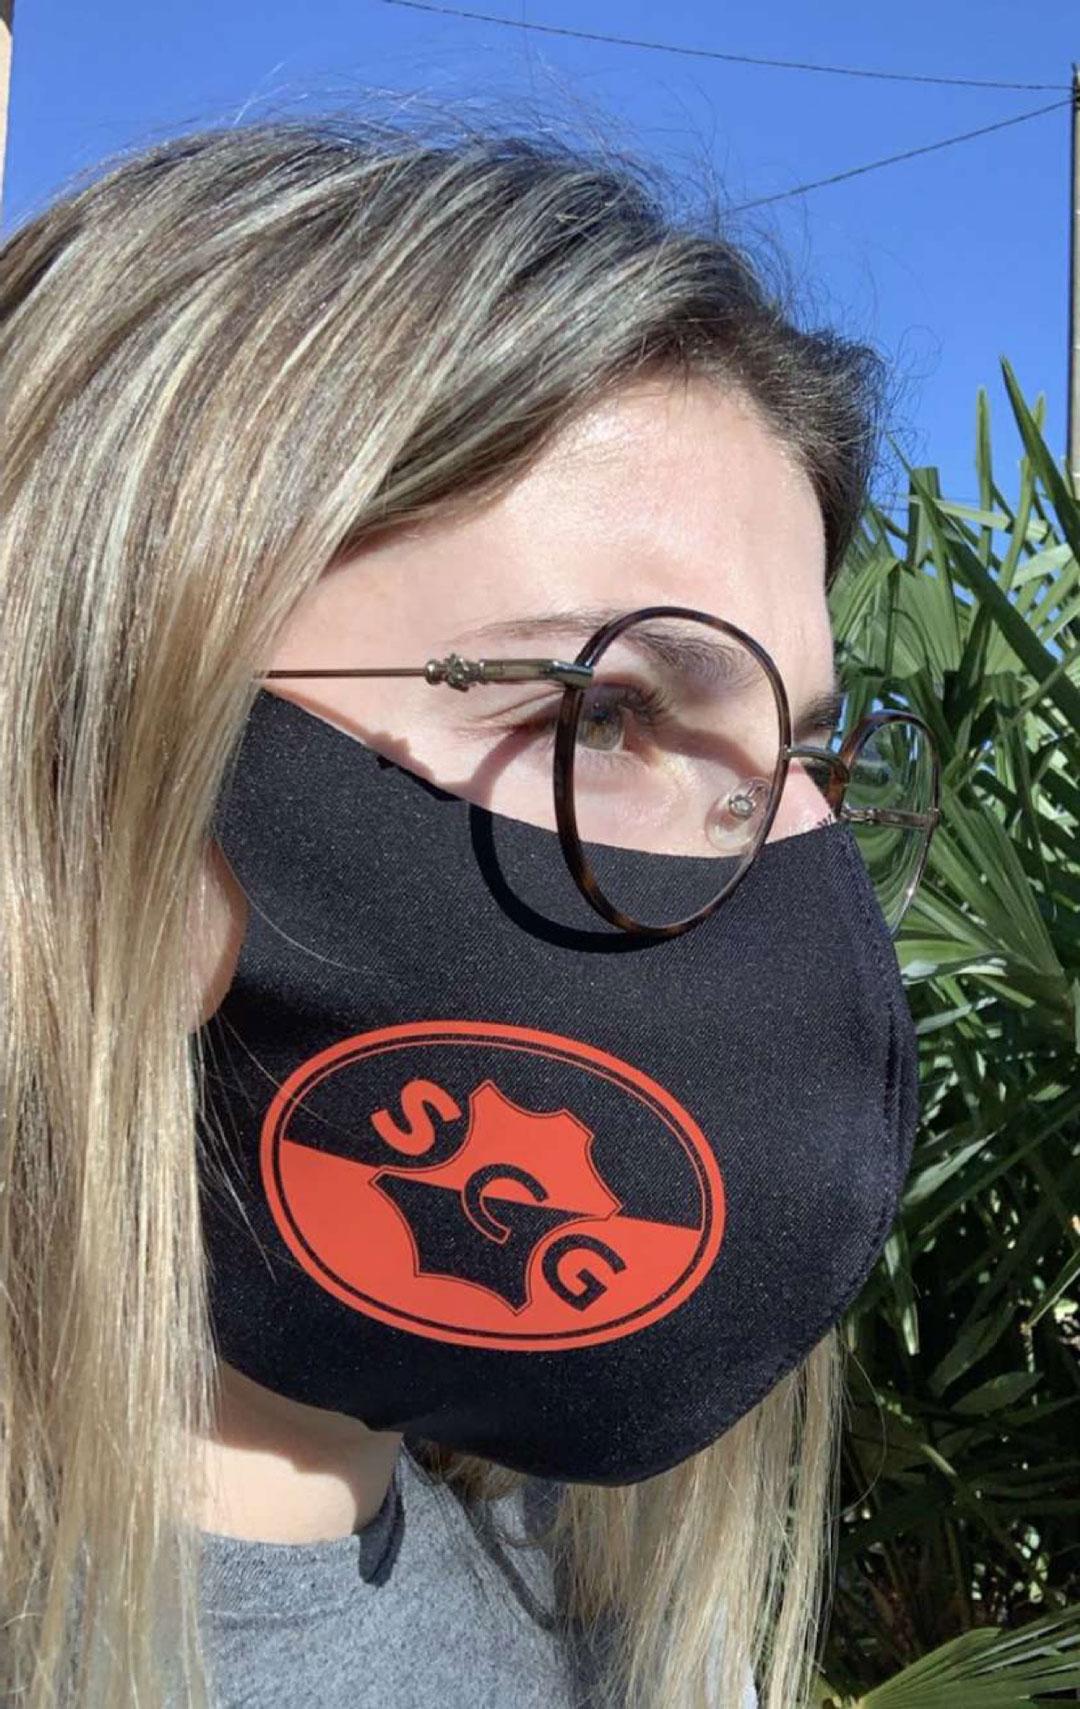 Masque SCG - 2